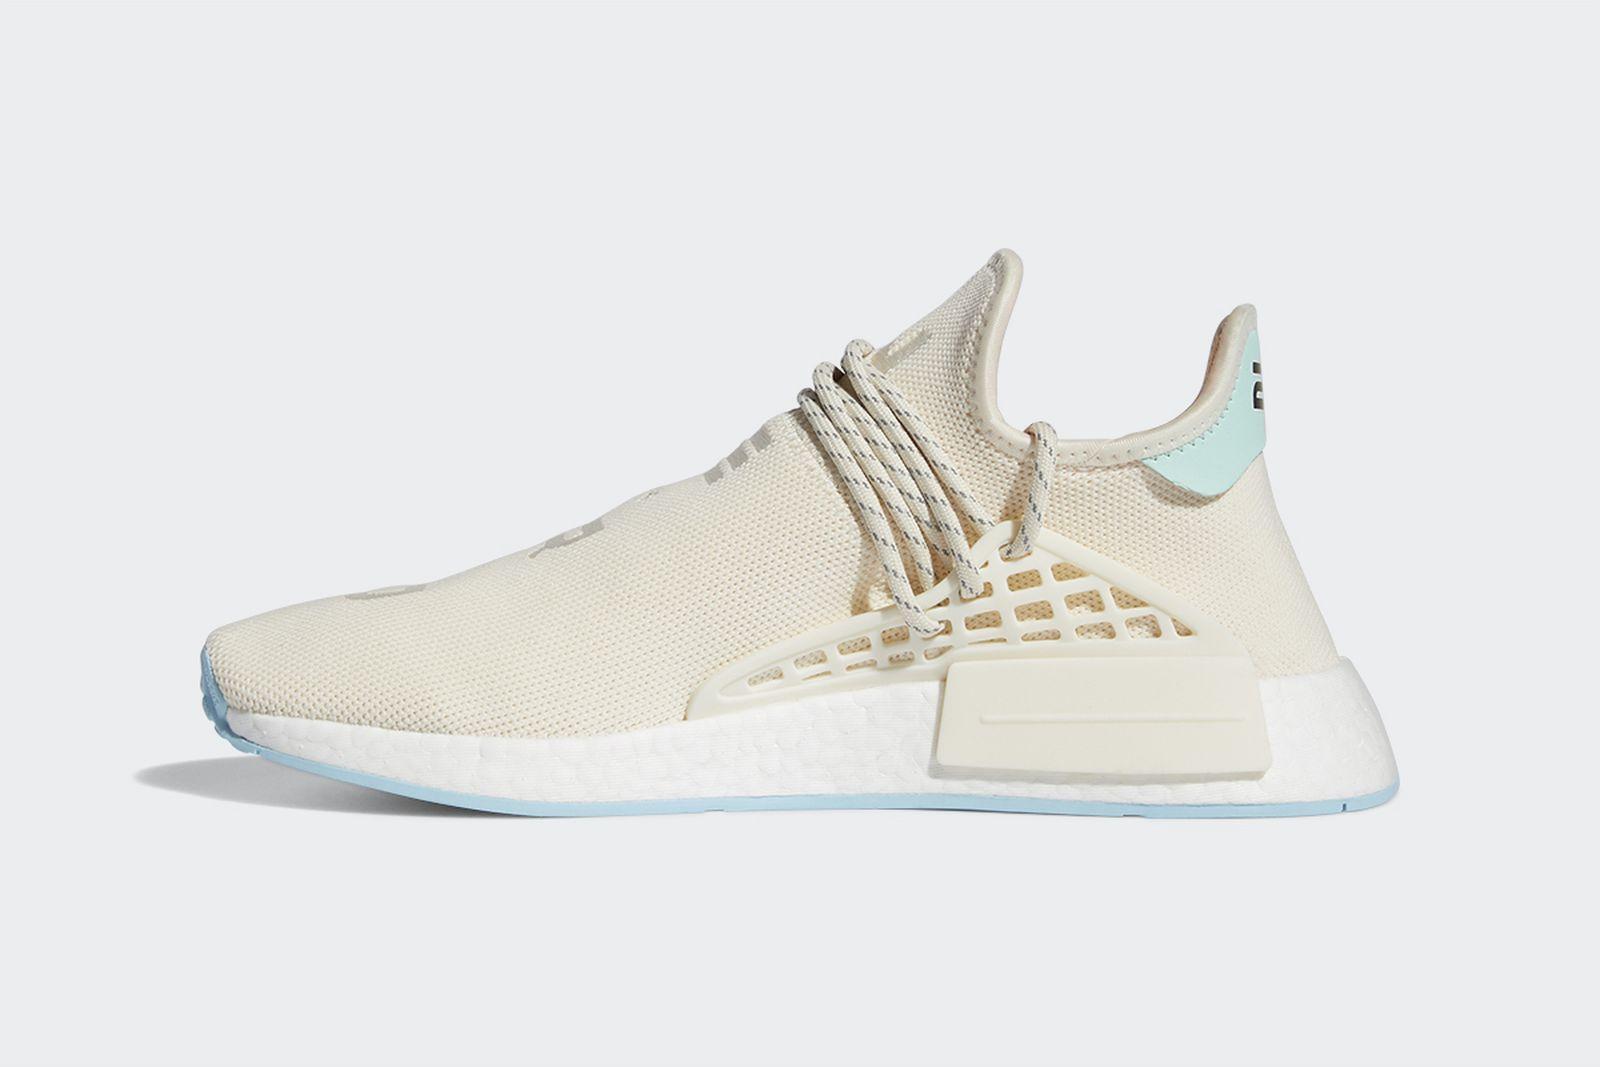 nerd-adidas-nmd-hu-release-date-price-1-02